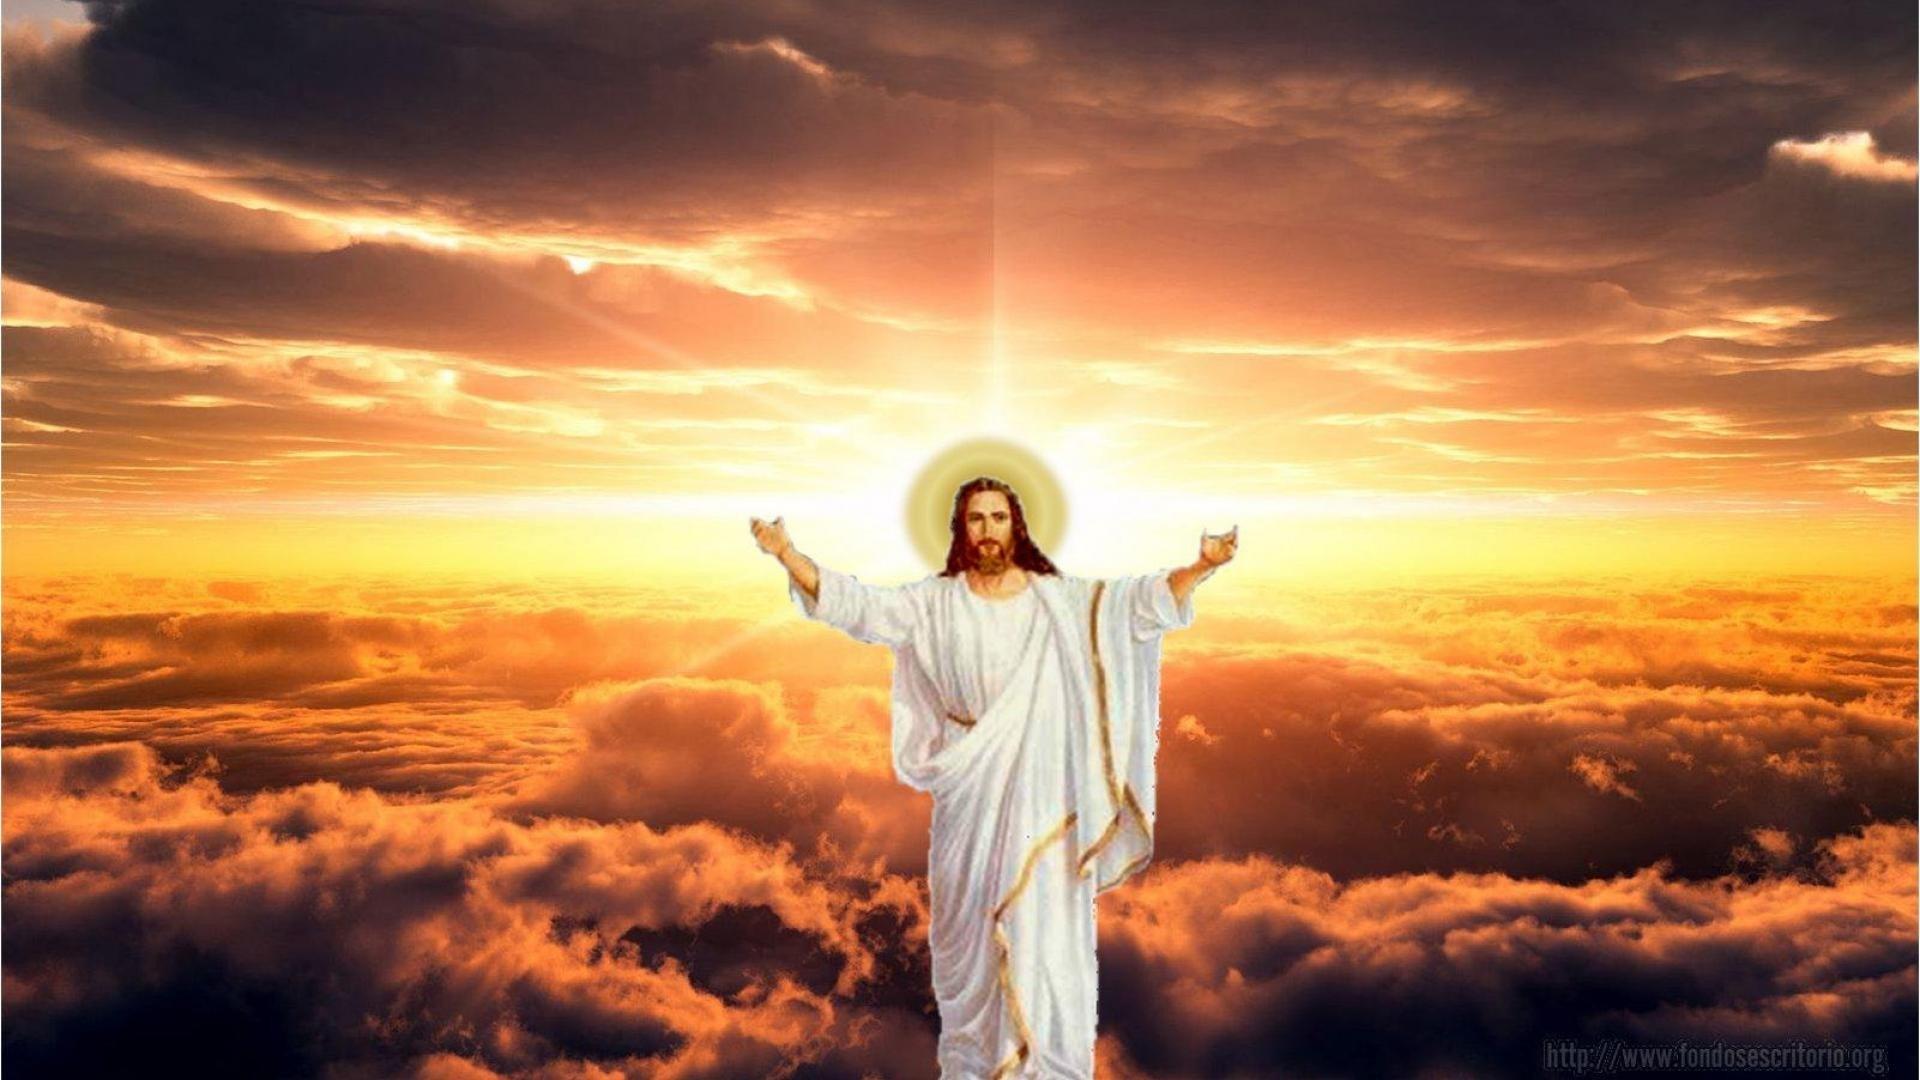 Pictures Of Jesus Christ   Jesus Wallpaper Hd Hd Wallpapers 1920x1080